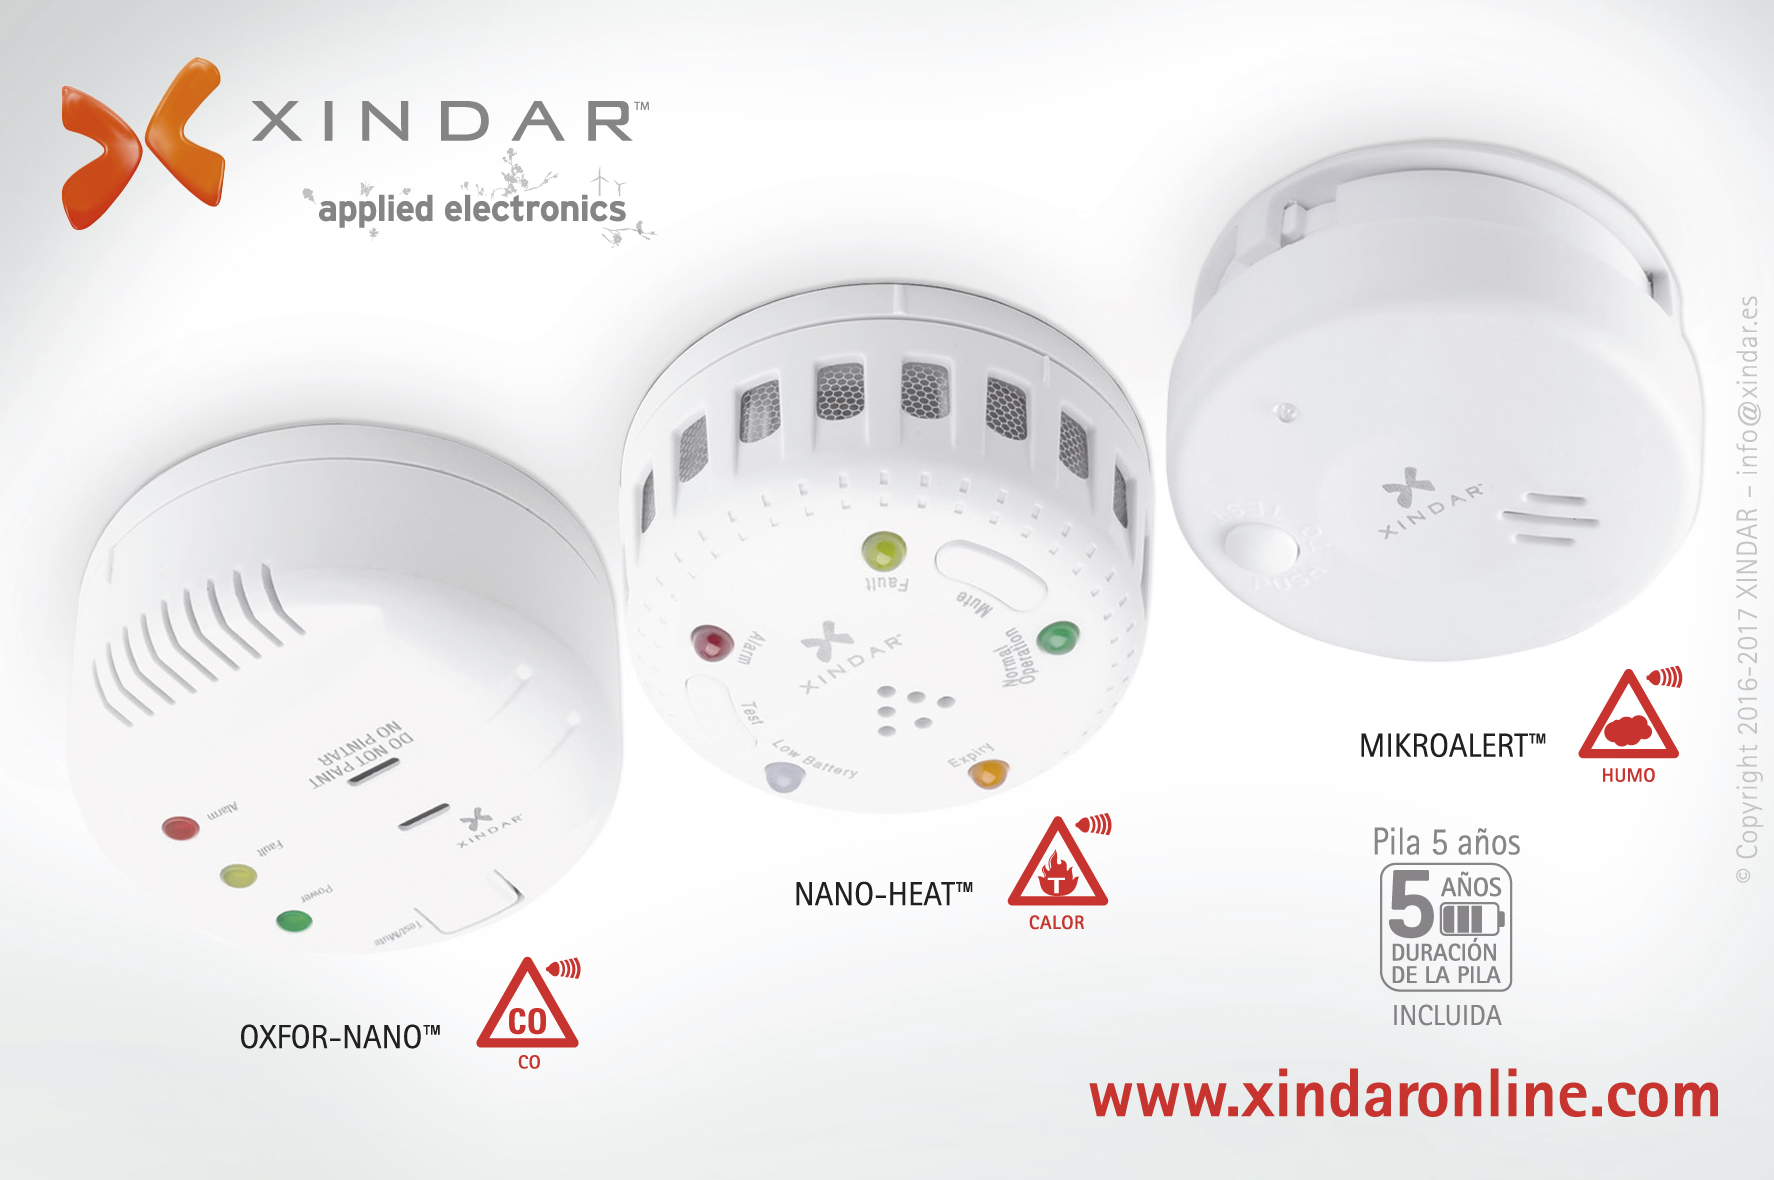 NANO Series – SEGURIDAD XINDAR